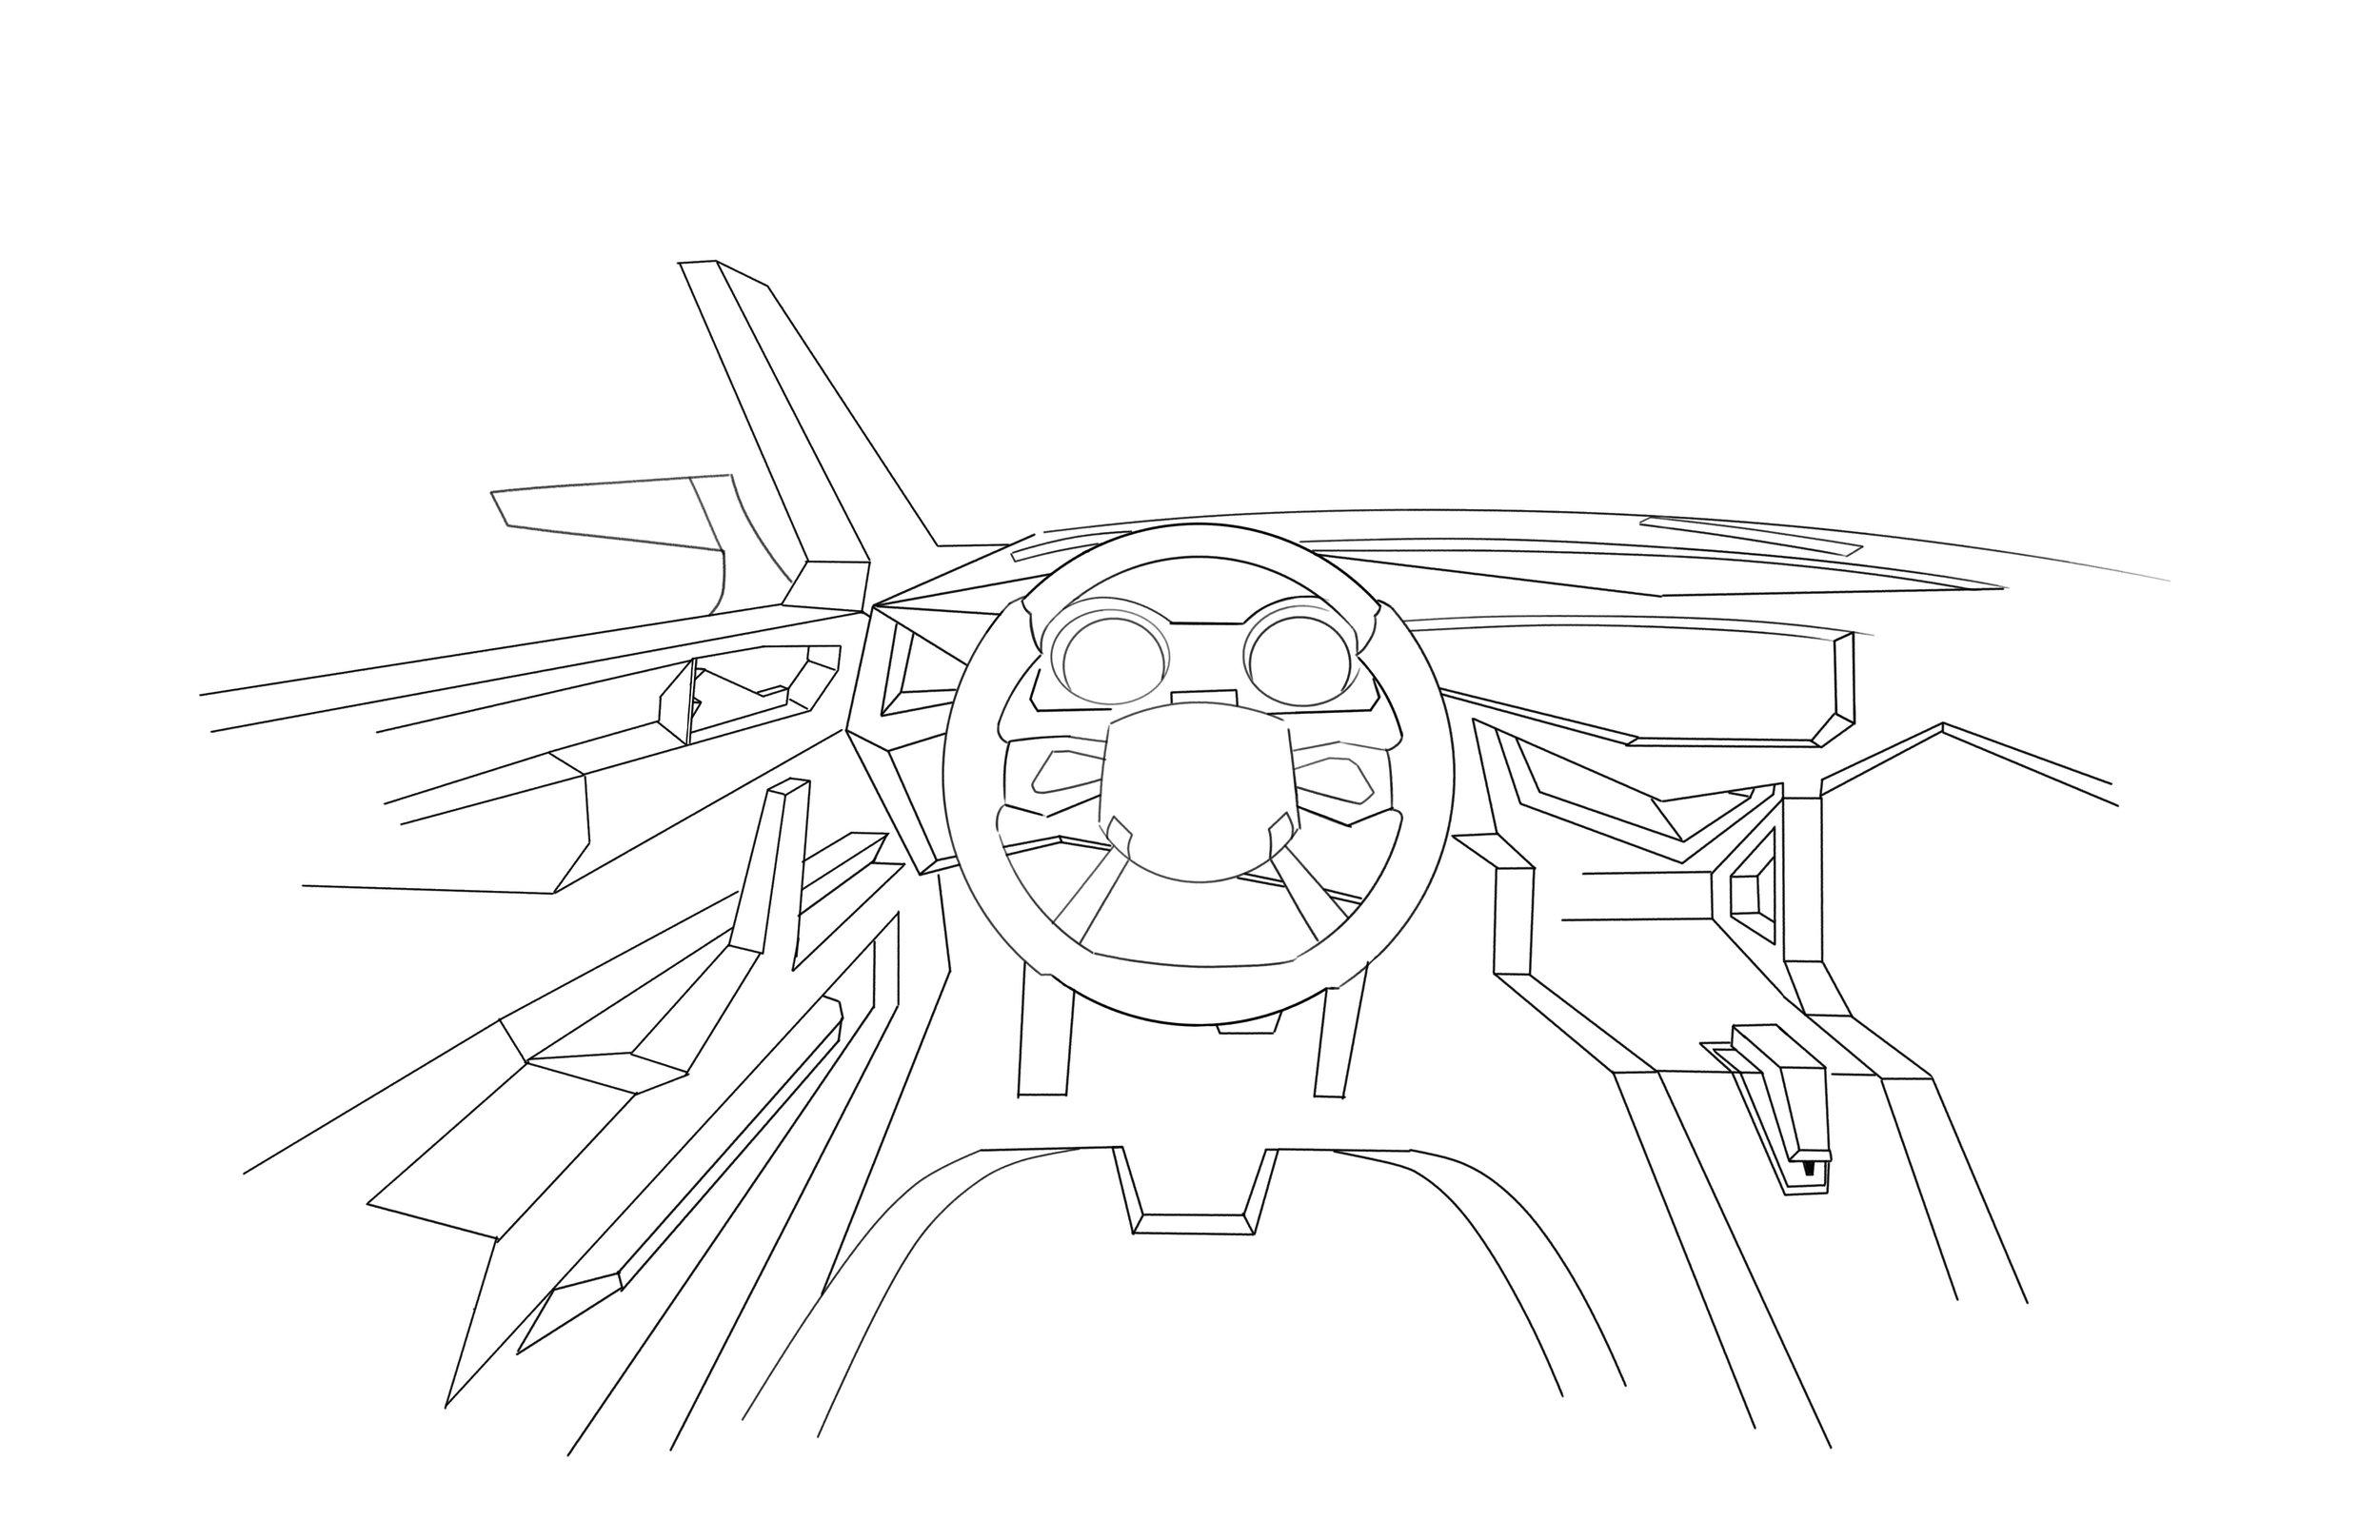 Car Design - Subaru STI Prototype, Interior Mock-Up   Digital Sketch, Sketchbook Pro